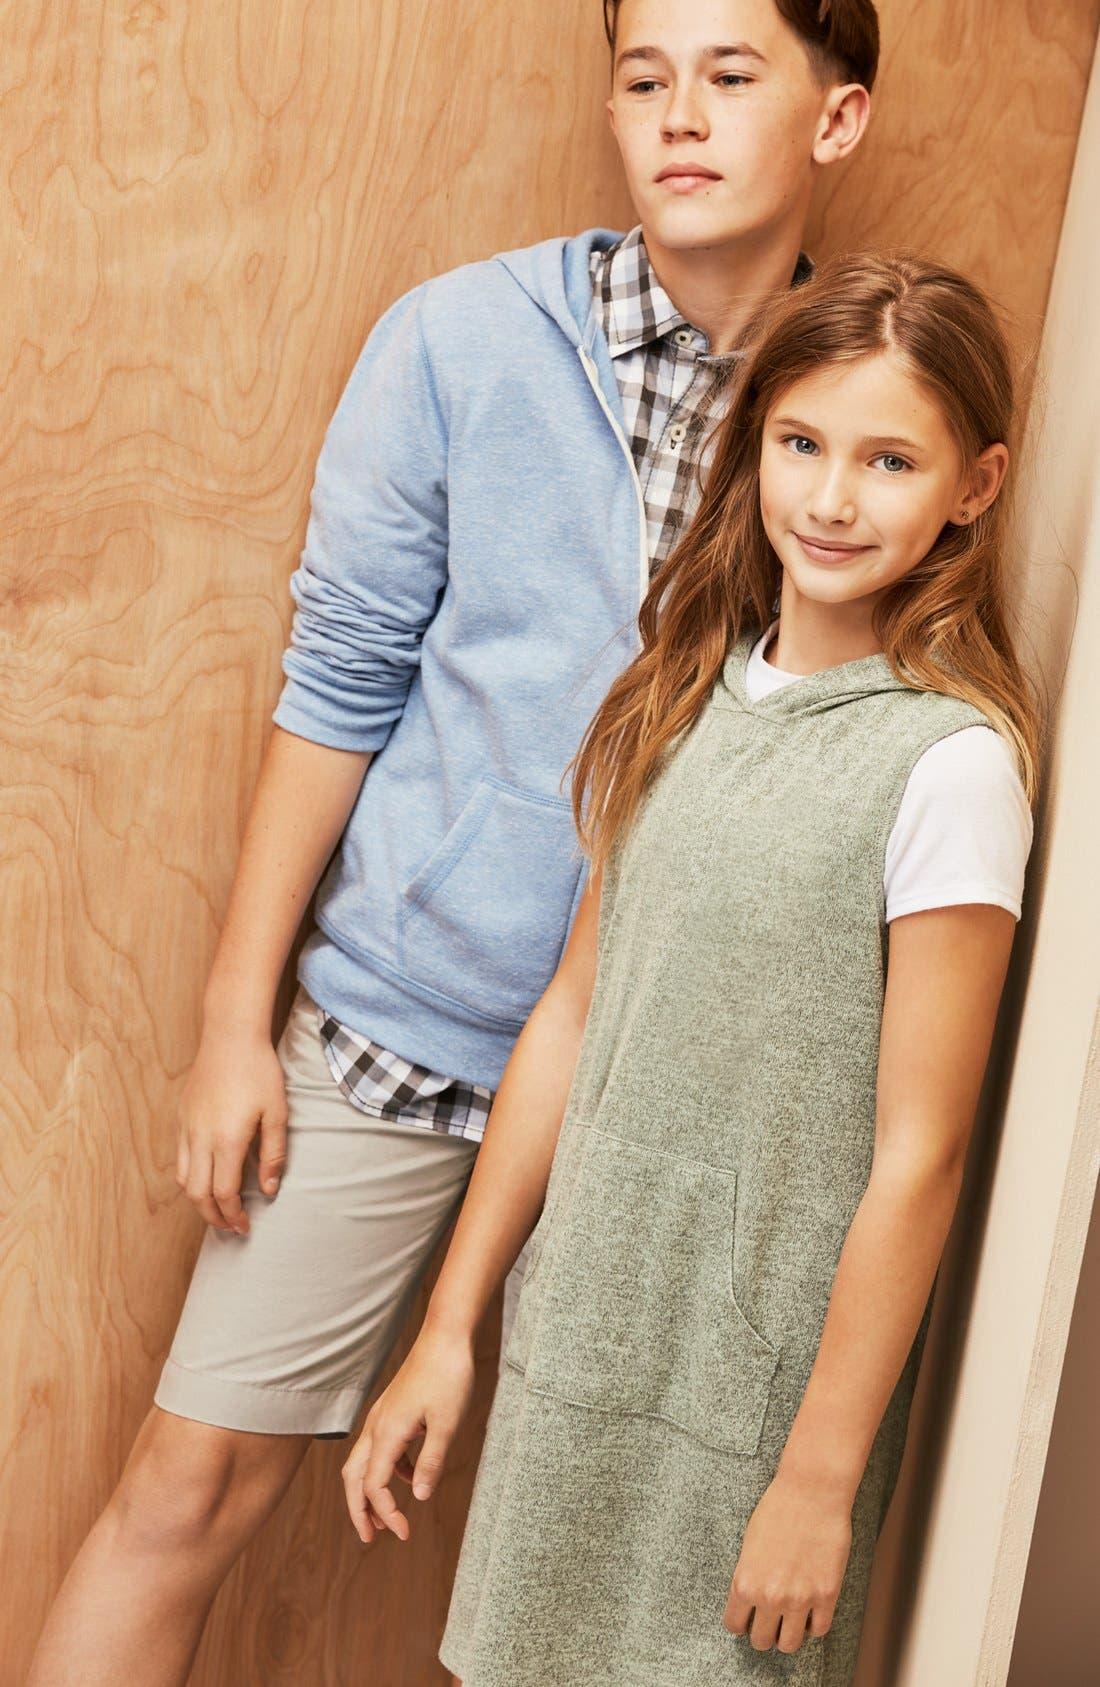 'Photo Op' Long Sleeve Cotton Woven Shirt,                             Alternate thumbnail 3, color,                             NAVY DENIM MADRAS PLAID